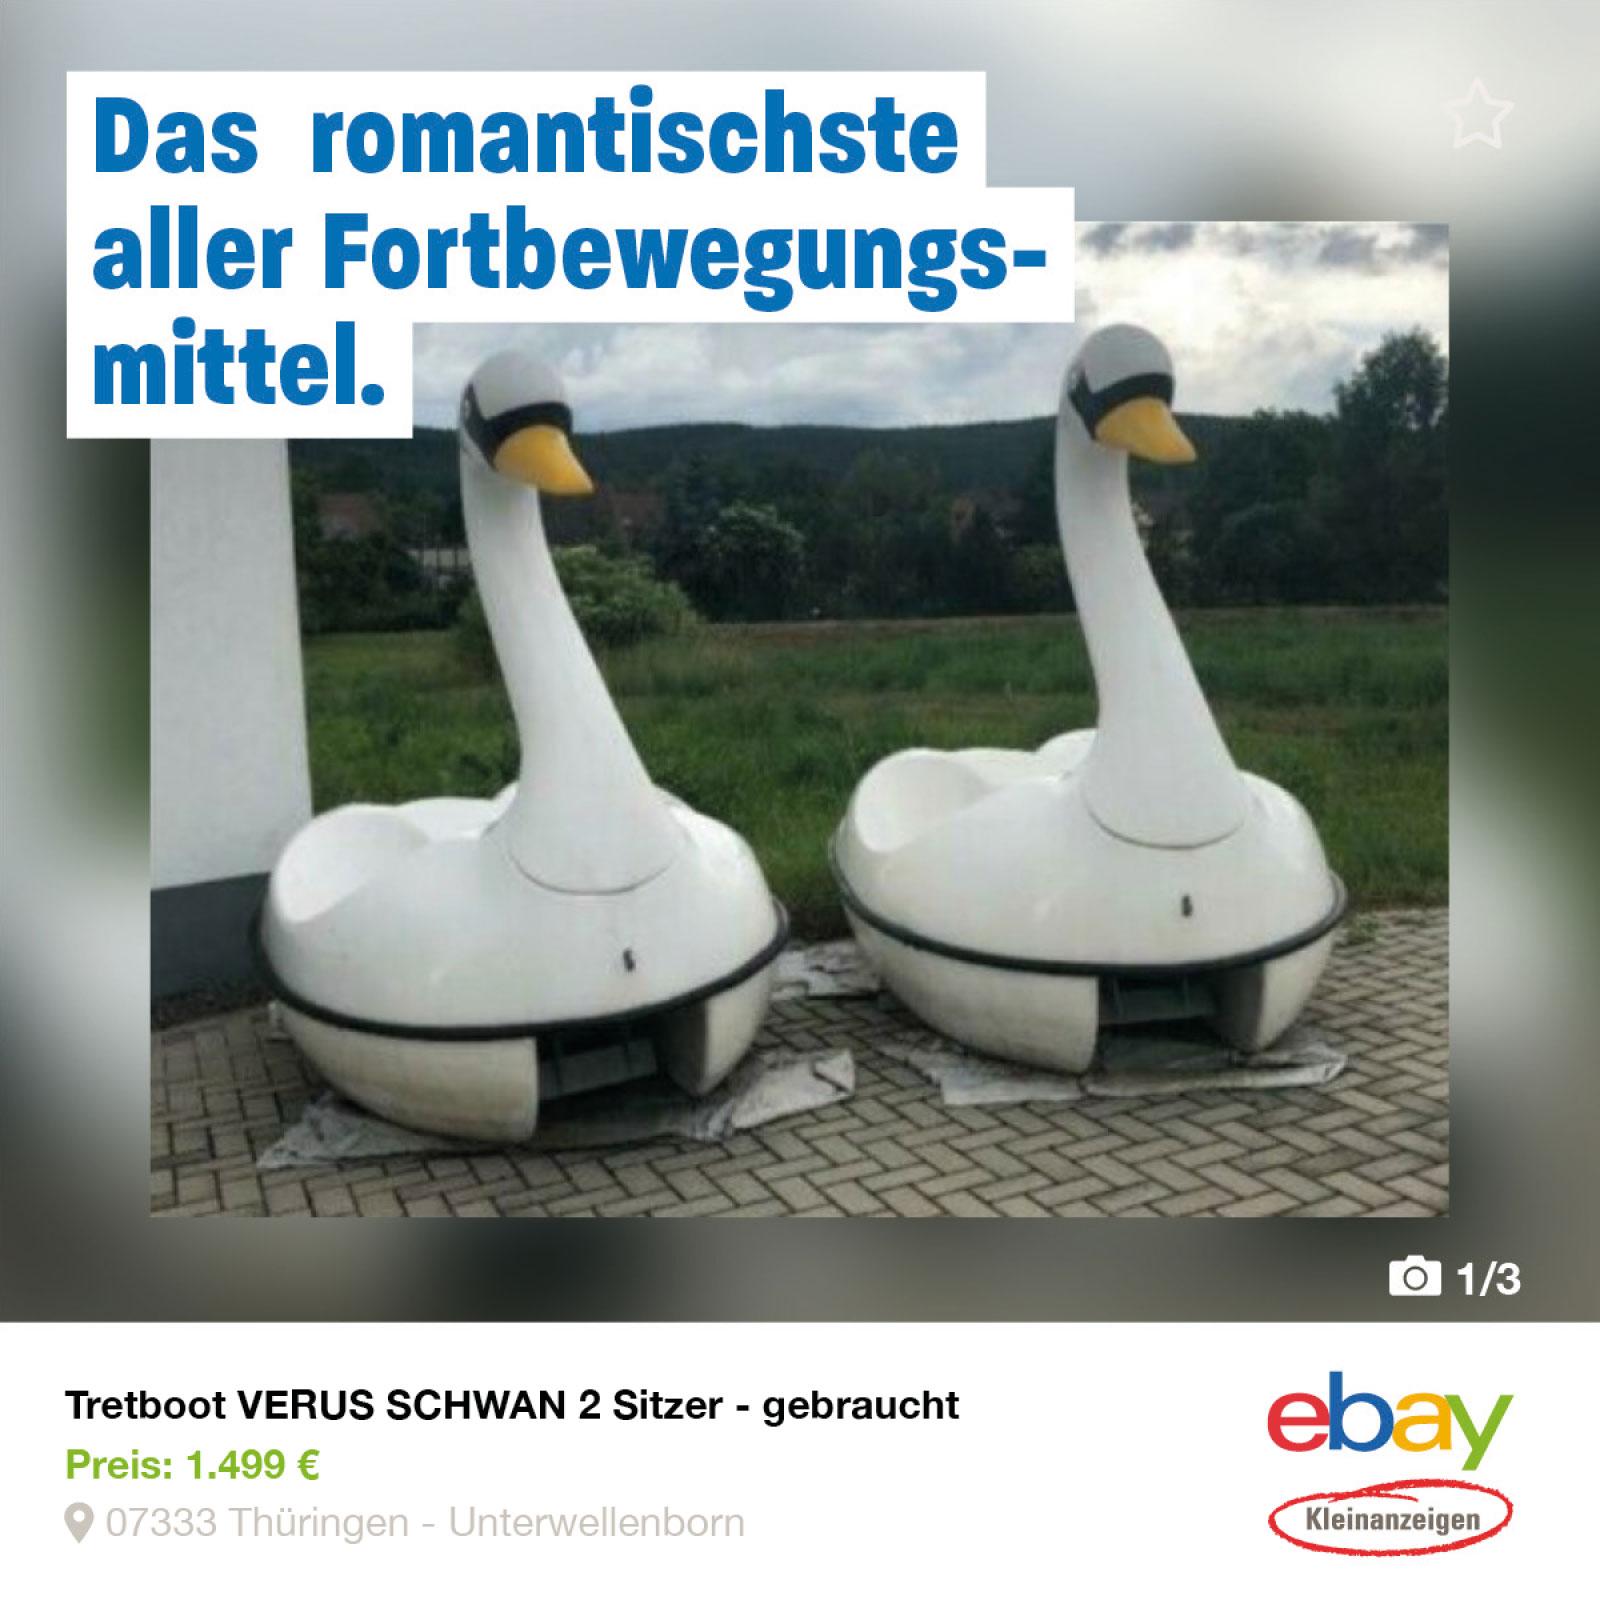 ebay_postings_14x14_rz_10